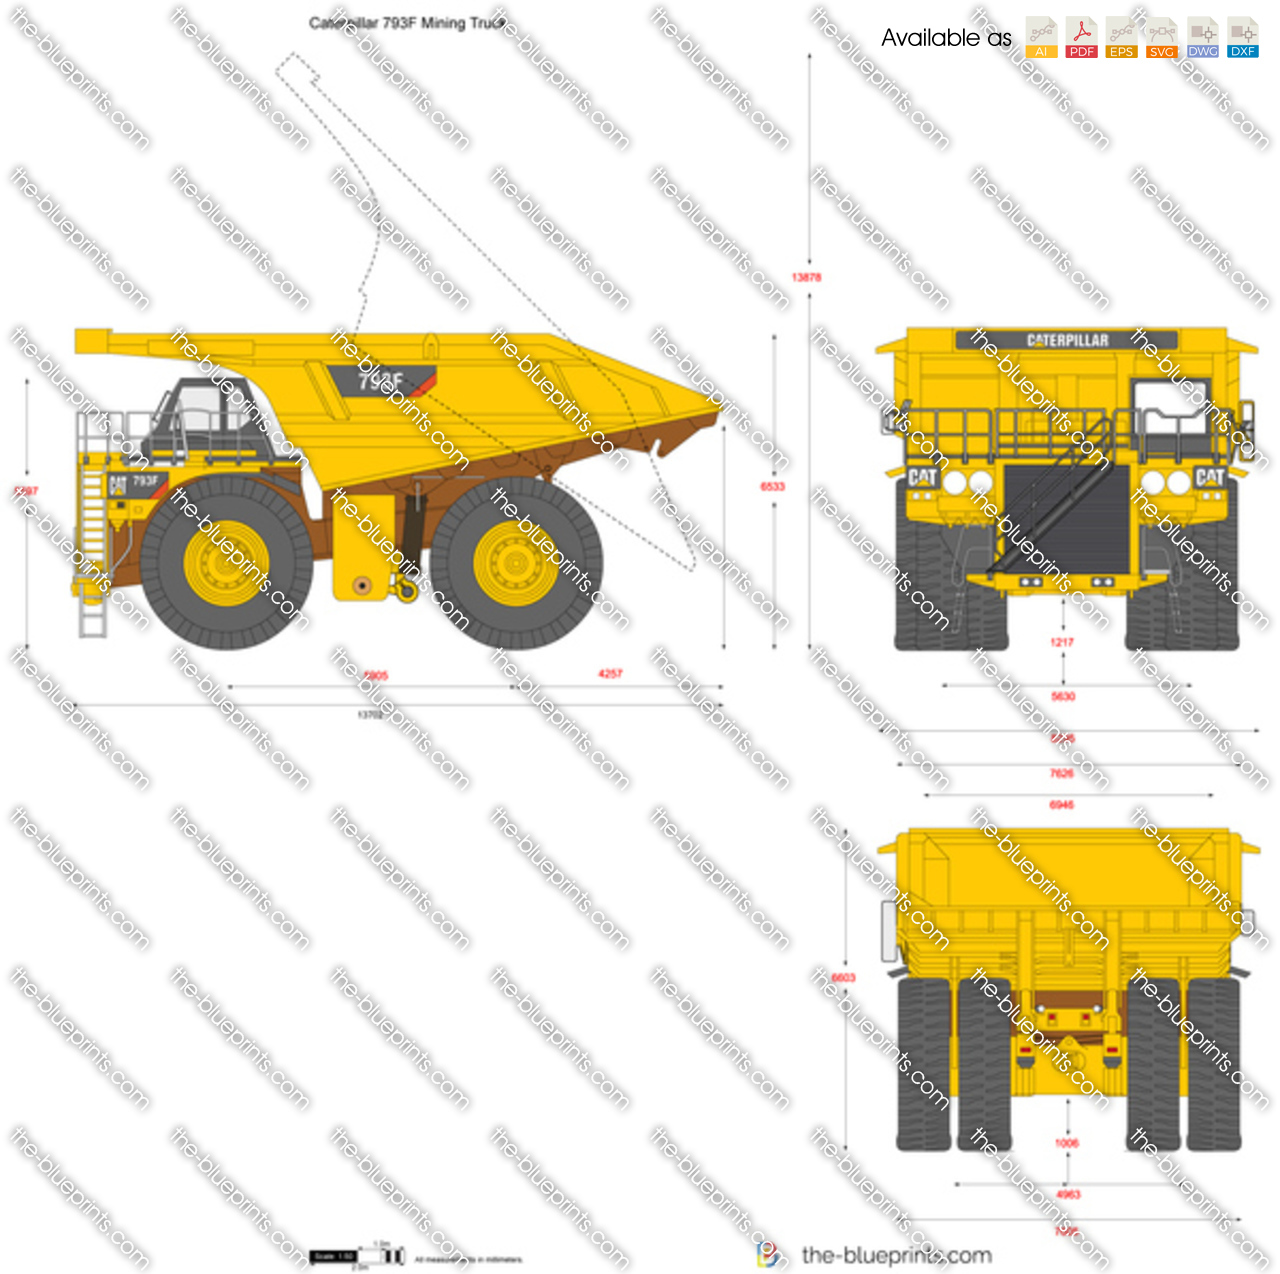 Caterpillar mining truck capacity